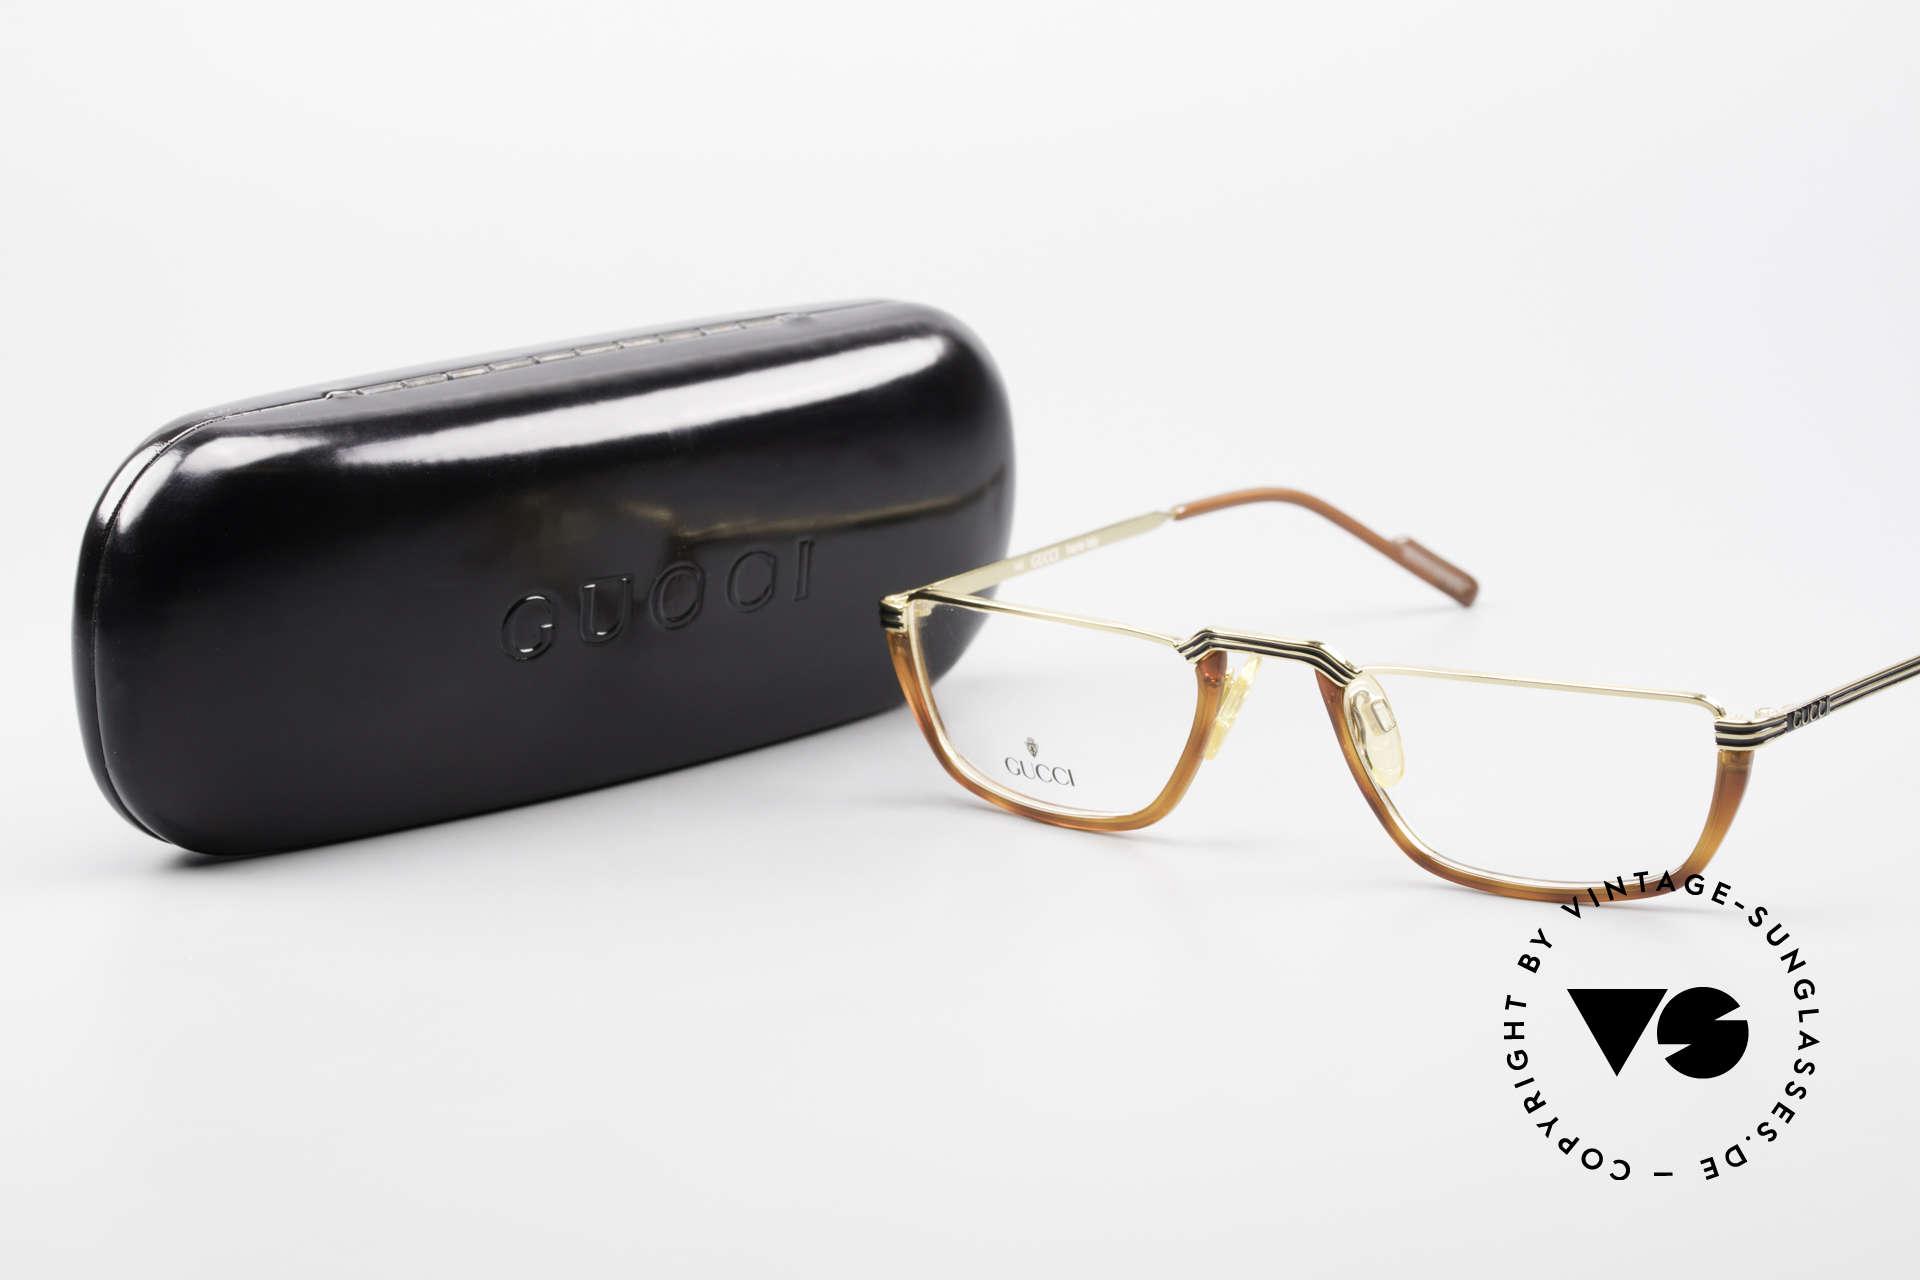 Gucci 1306 Designer Reading Eyeglasses, Size: medium, Made for Men